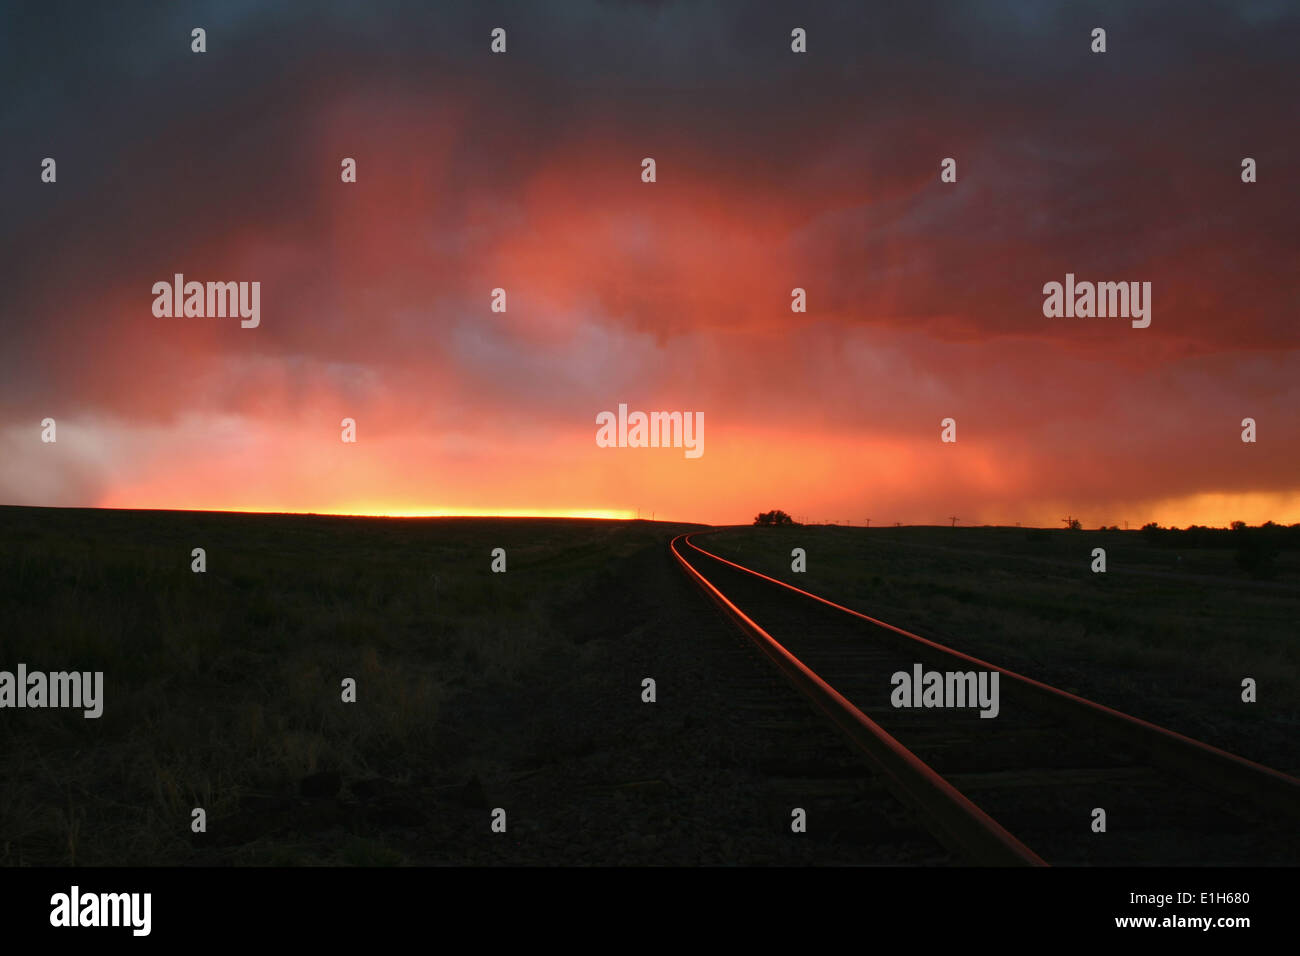 Intense sunset colors illuminate the railroad tracks over this remote location, Burlington, Colorado, USA Stock Photo